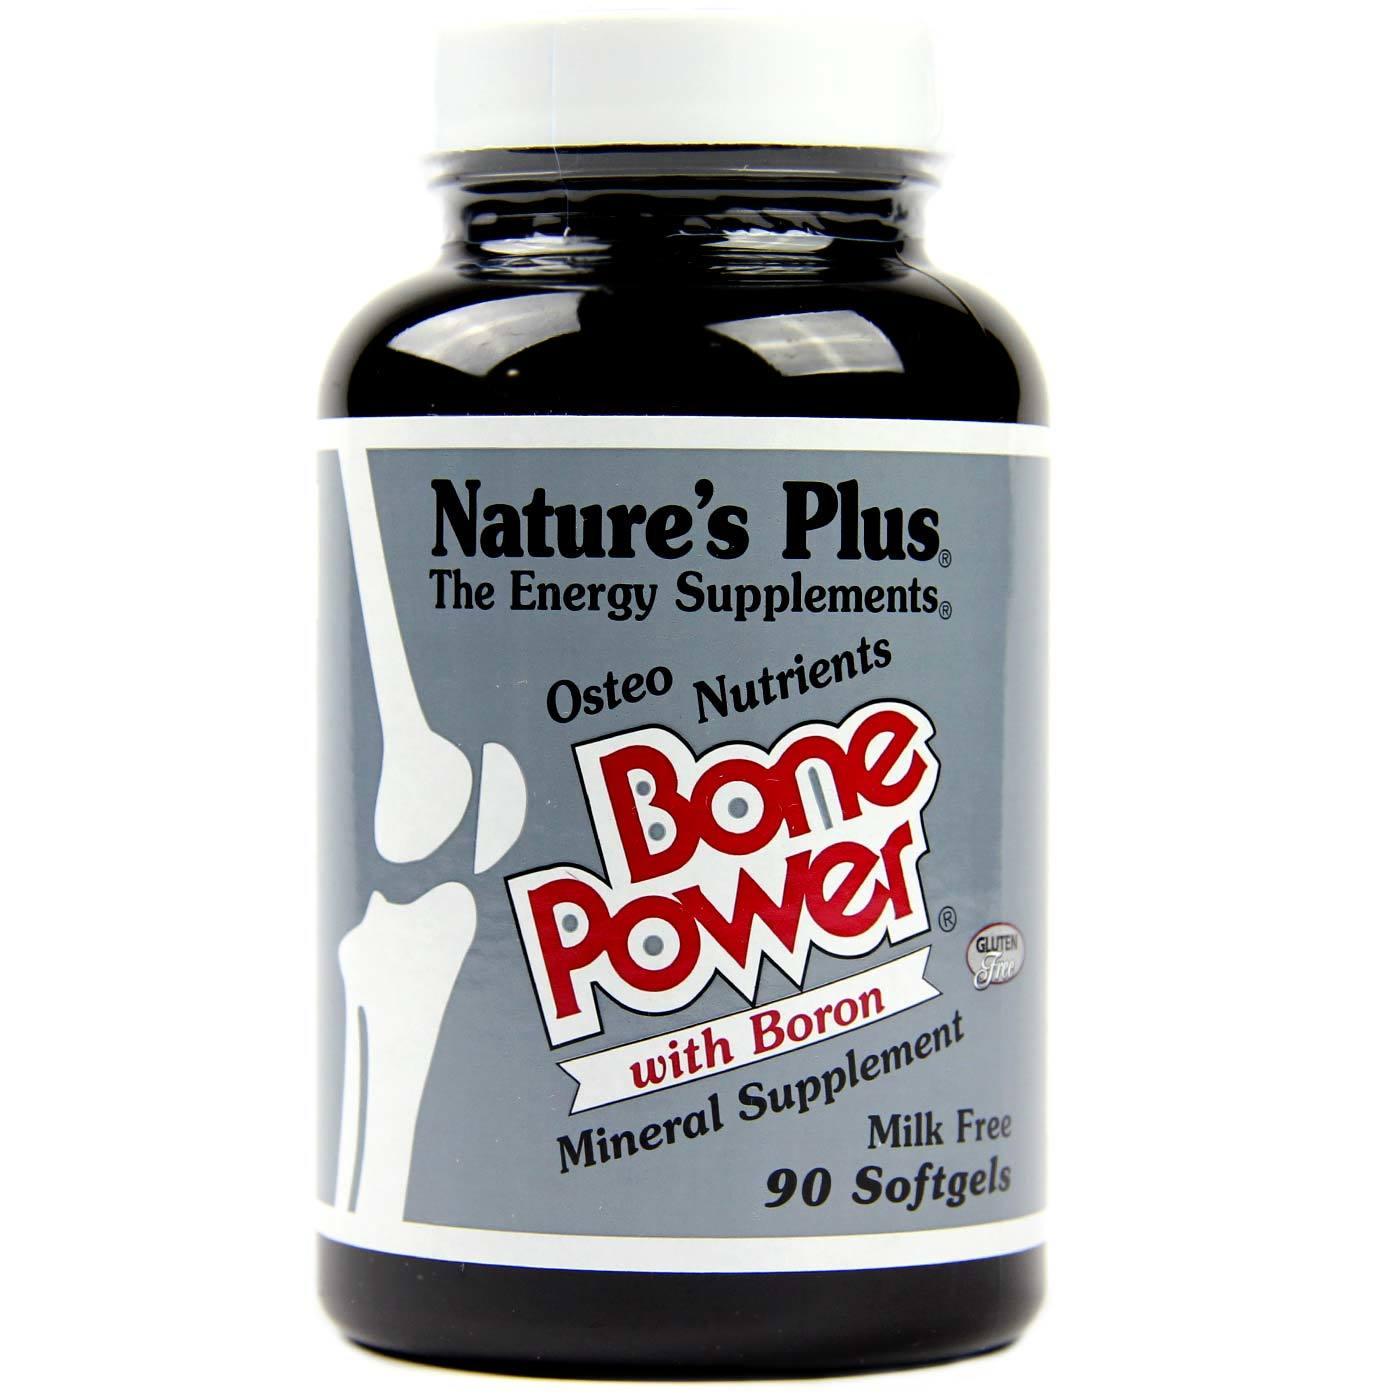 nature's plus bone power w/ boron - 90 softgels - evitamins, Skeleton